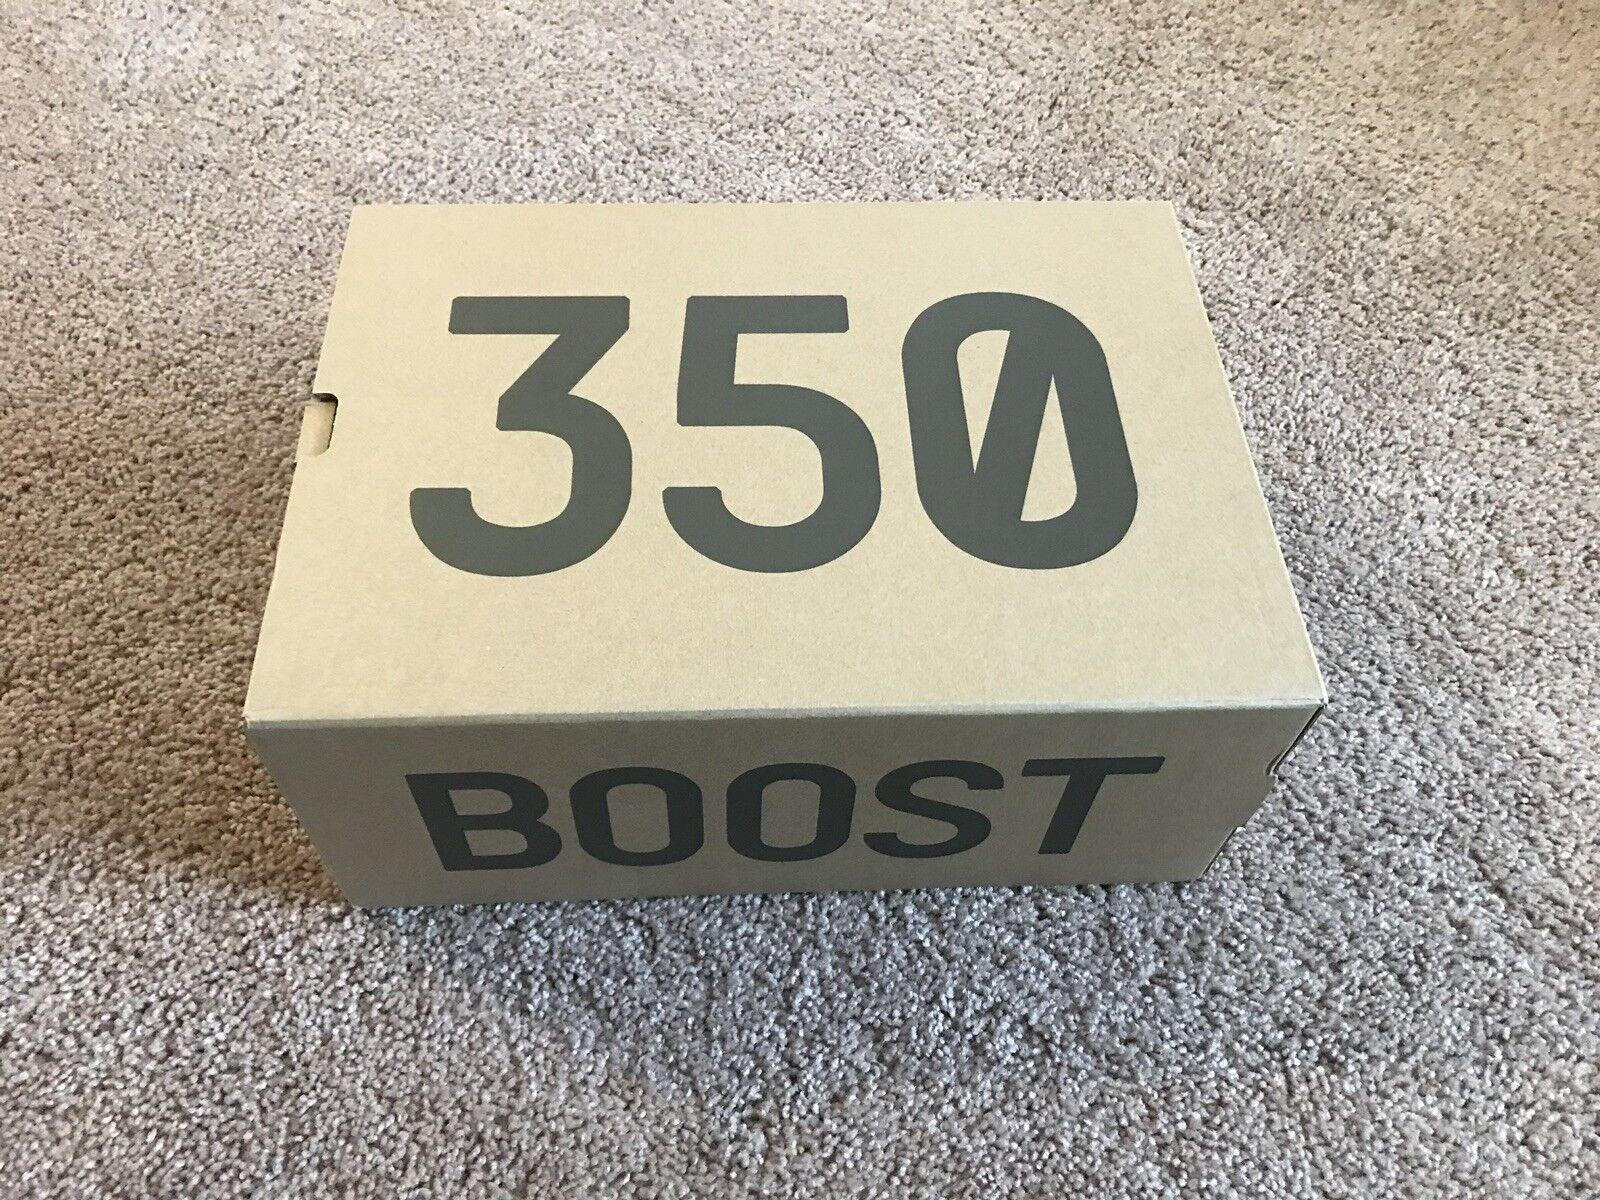 Yeezy Boost 350 V2 Beluga 2.0 AH2203 Adidas DS Size 9.5